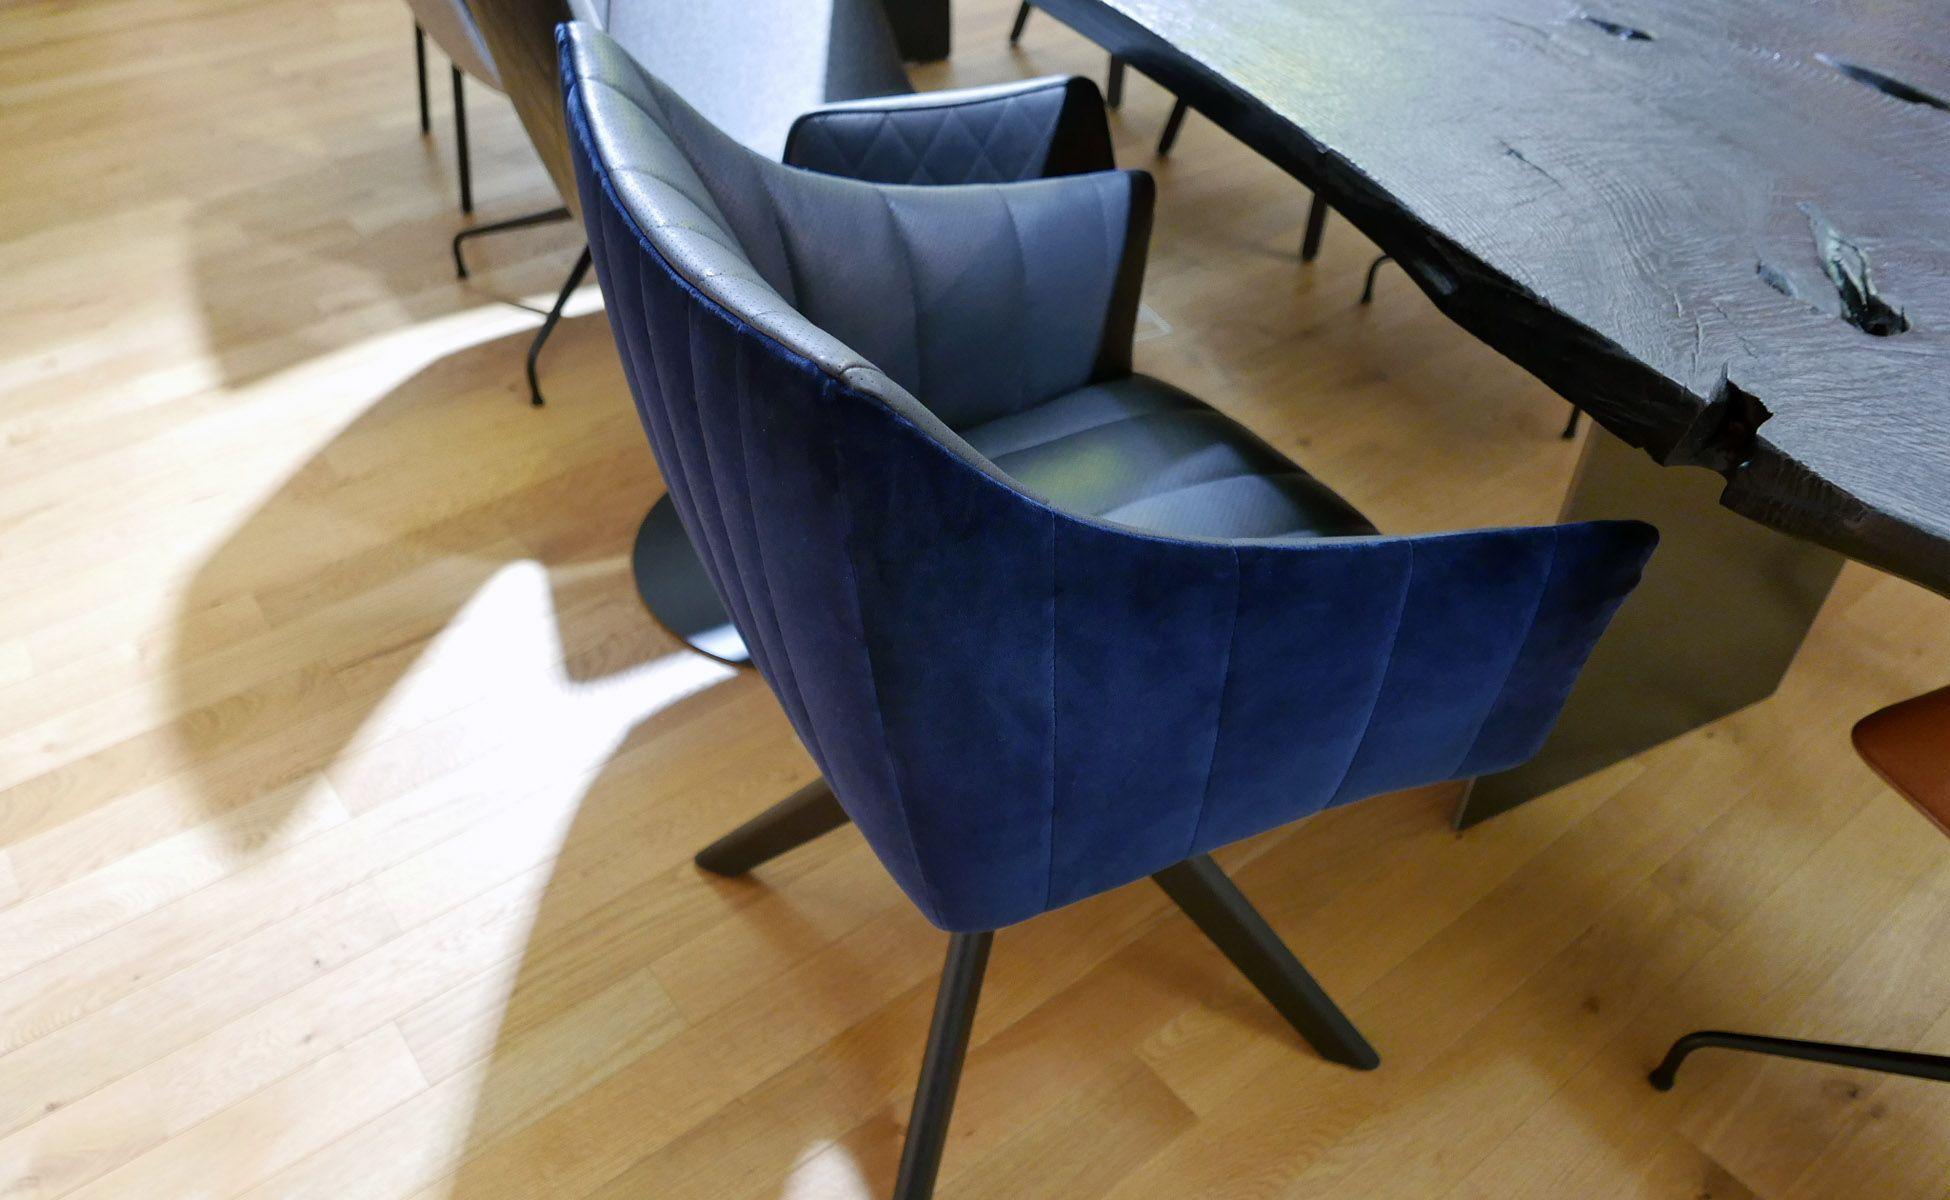 freifrau rubie armchair high bei steidten berlin freifrau m bel bei steidten berlin. Black Bedroom Furniture Sets. Home Design Ideas